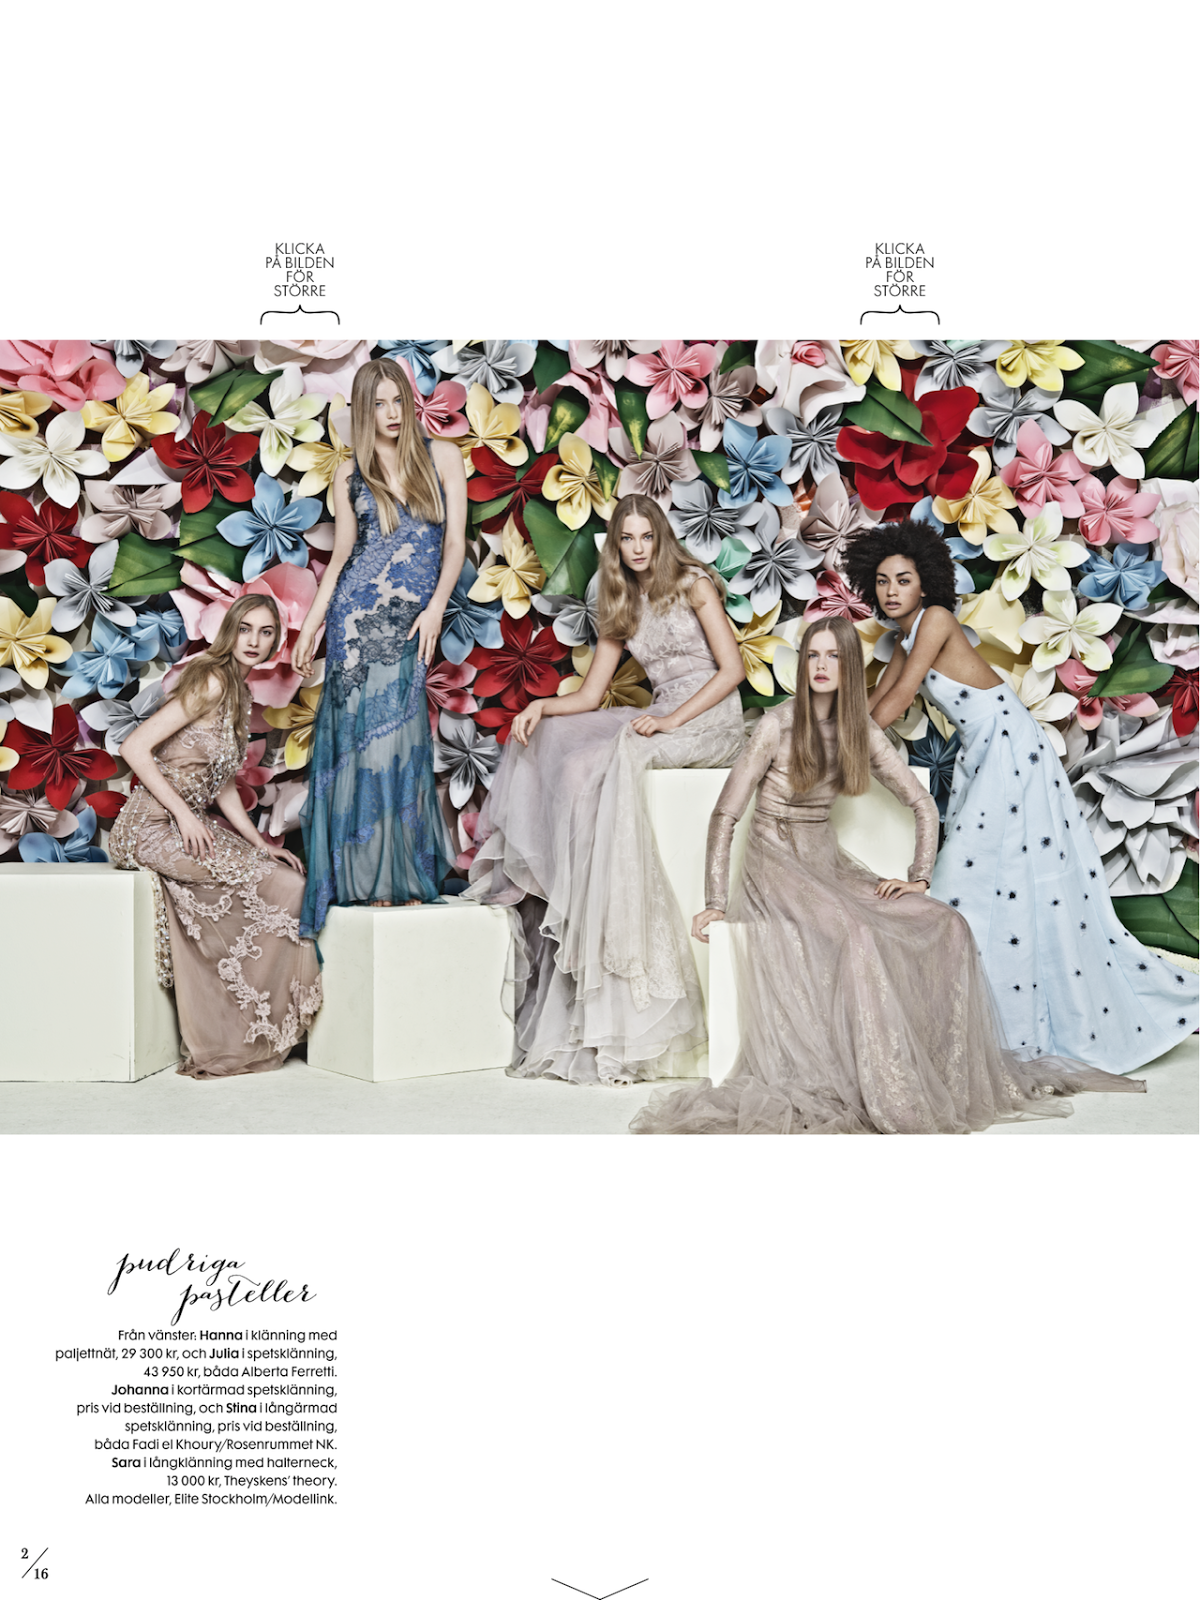 #HannaRundlof #JuliaGreslingaas #JohannaJonsson #StinaRappWastenson & #SaraJohnsonby #CarlBengtsson for #ElleSweden February 2013